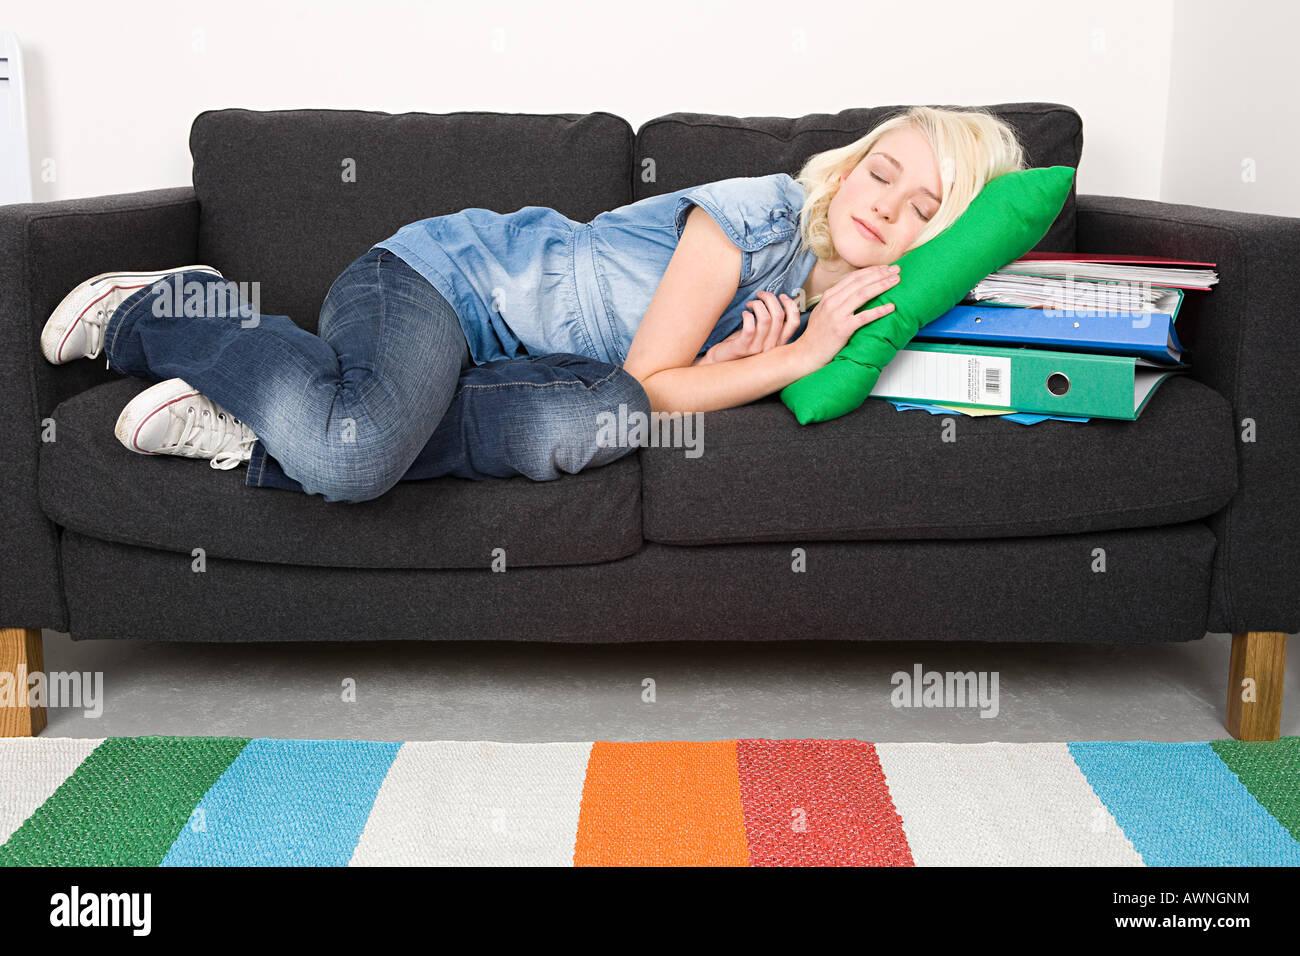 Enjoyable Female Student Sleeping On Sofa Stock Photo 16623295 Alamy Machost Co Dining Chair Design Ideas Machostcouk